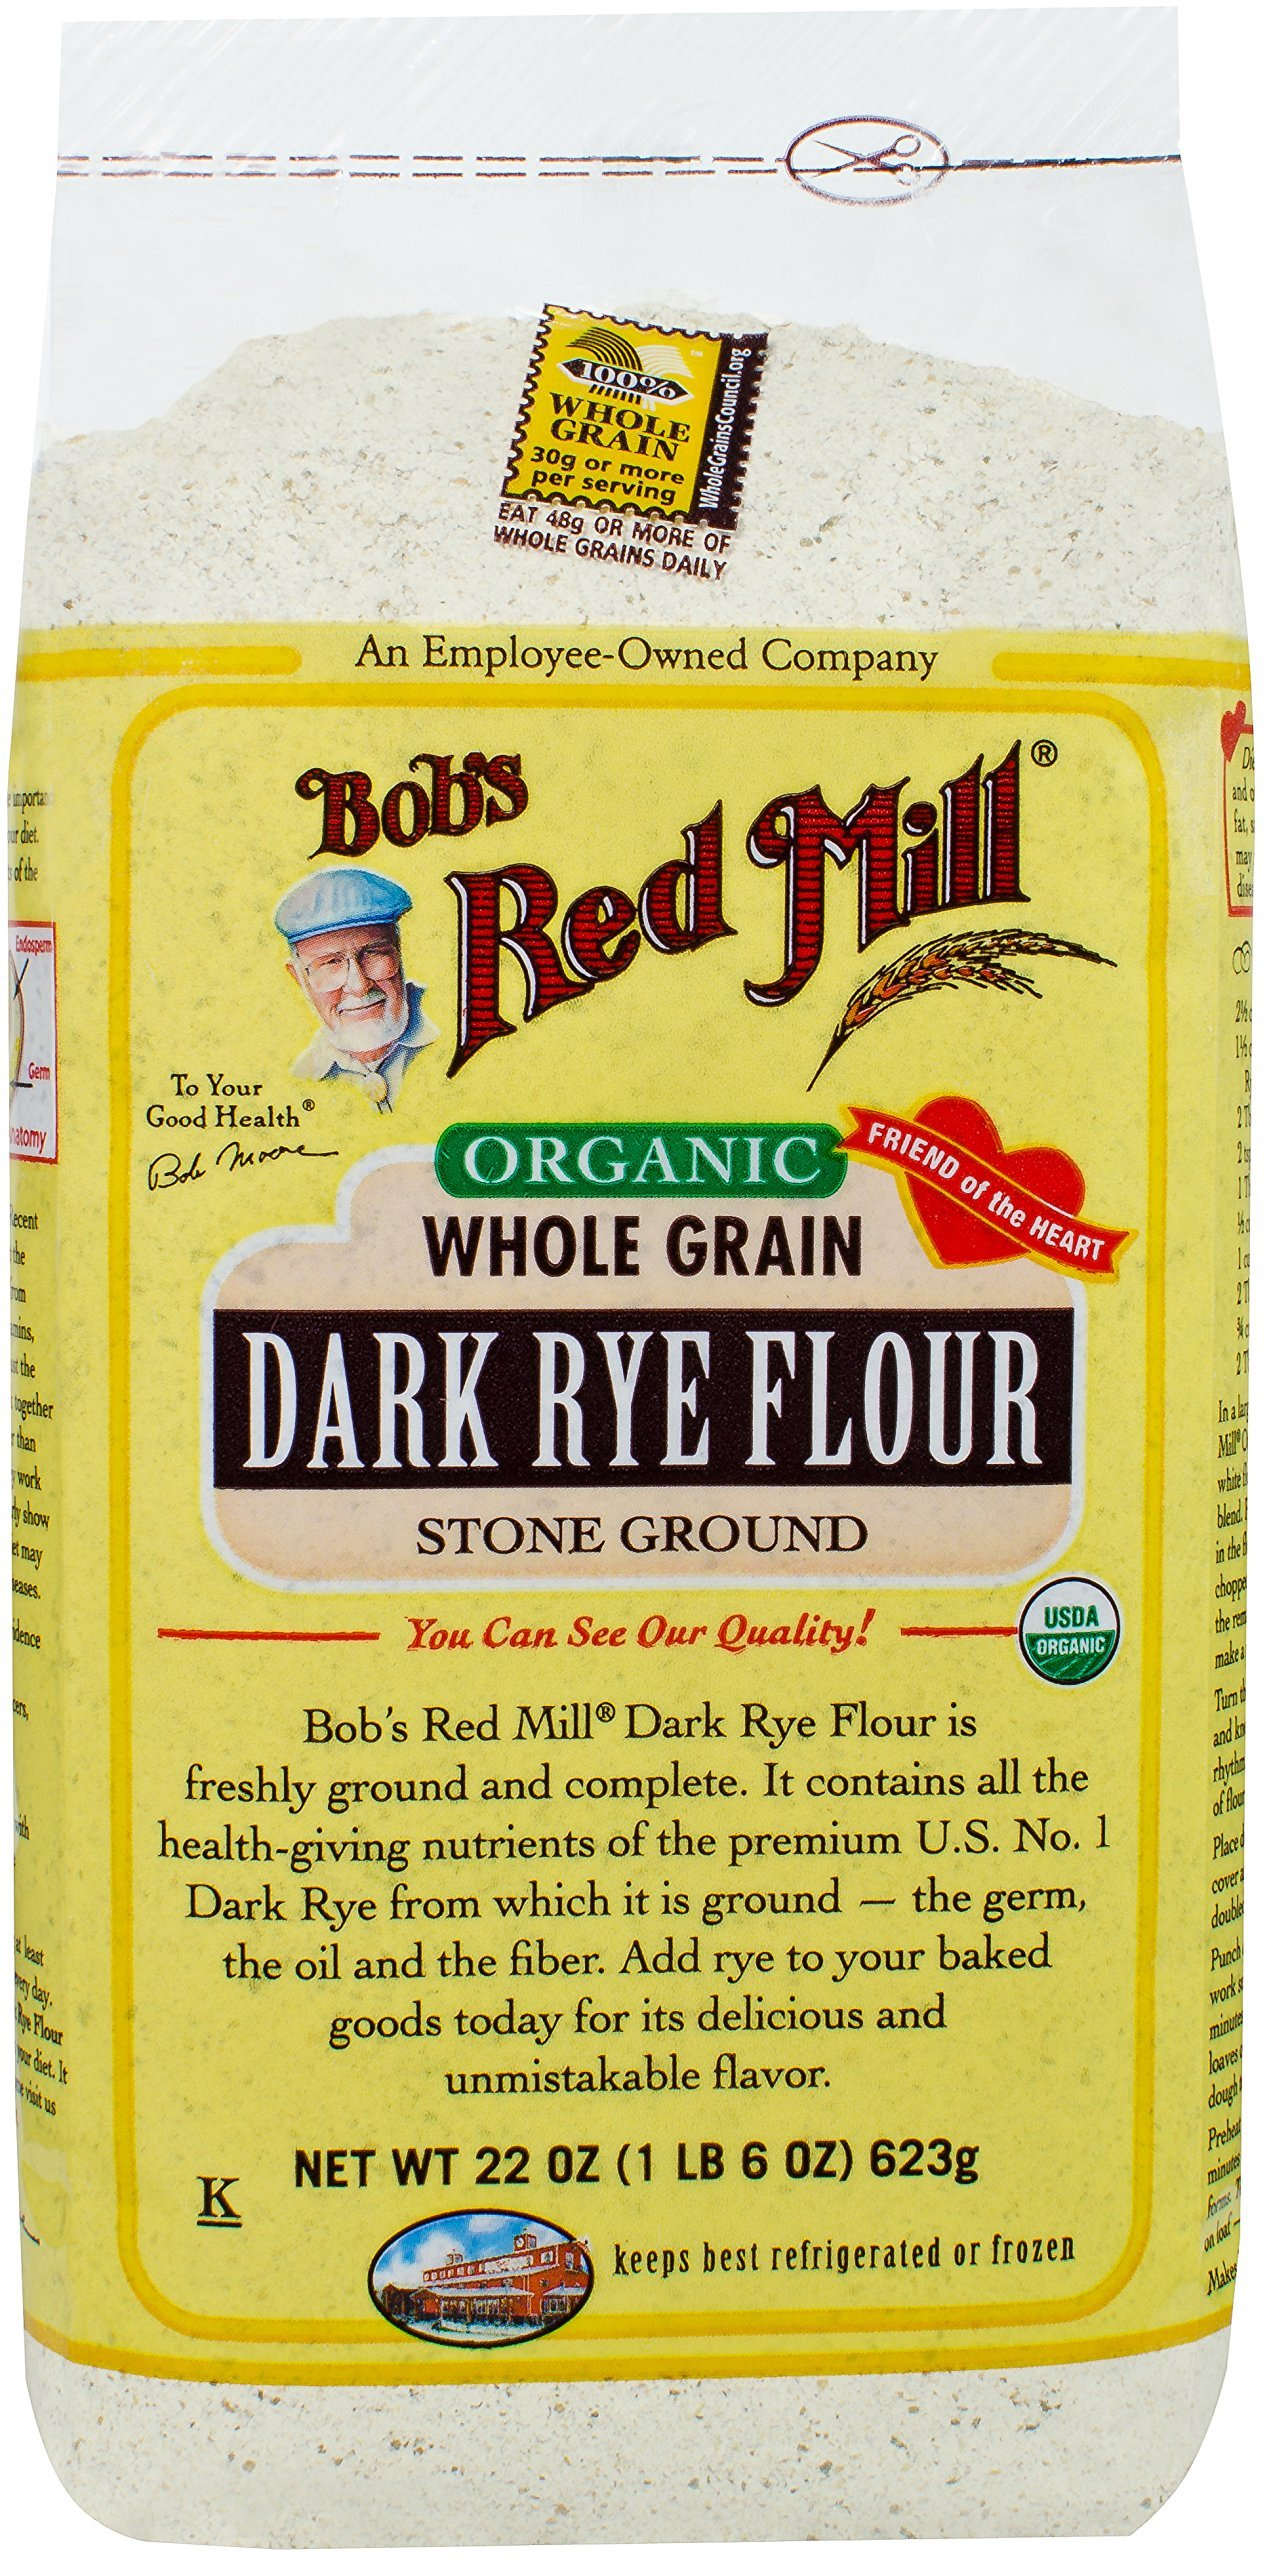 Bob's Red Mill Dark Rye Flour, 22 oz